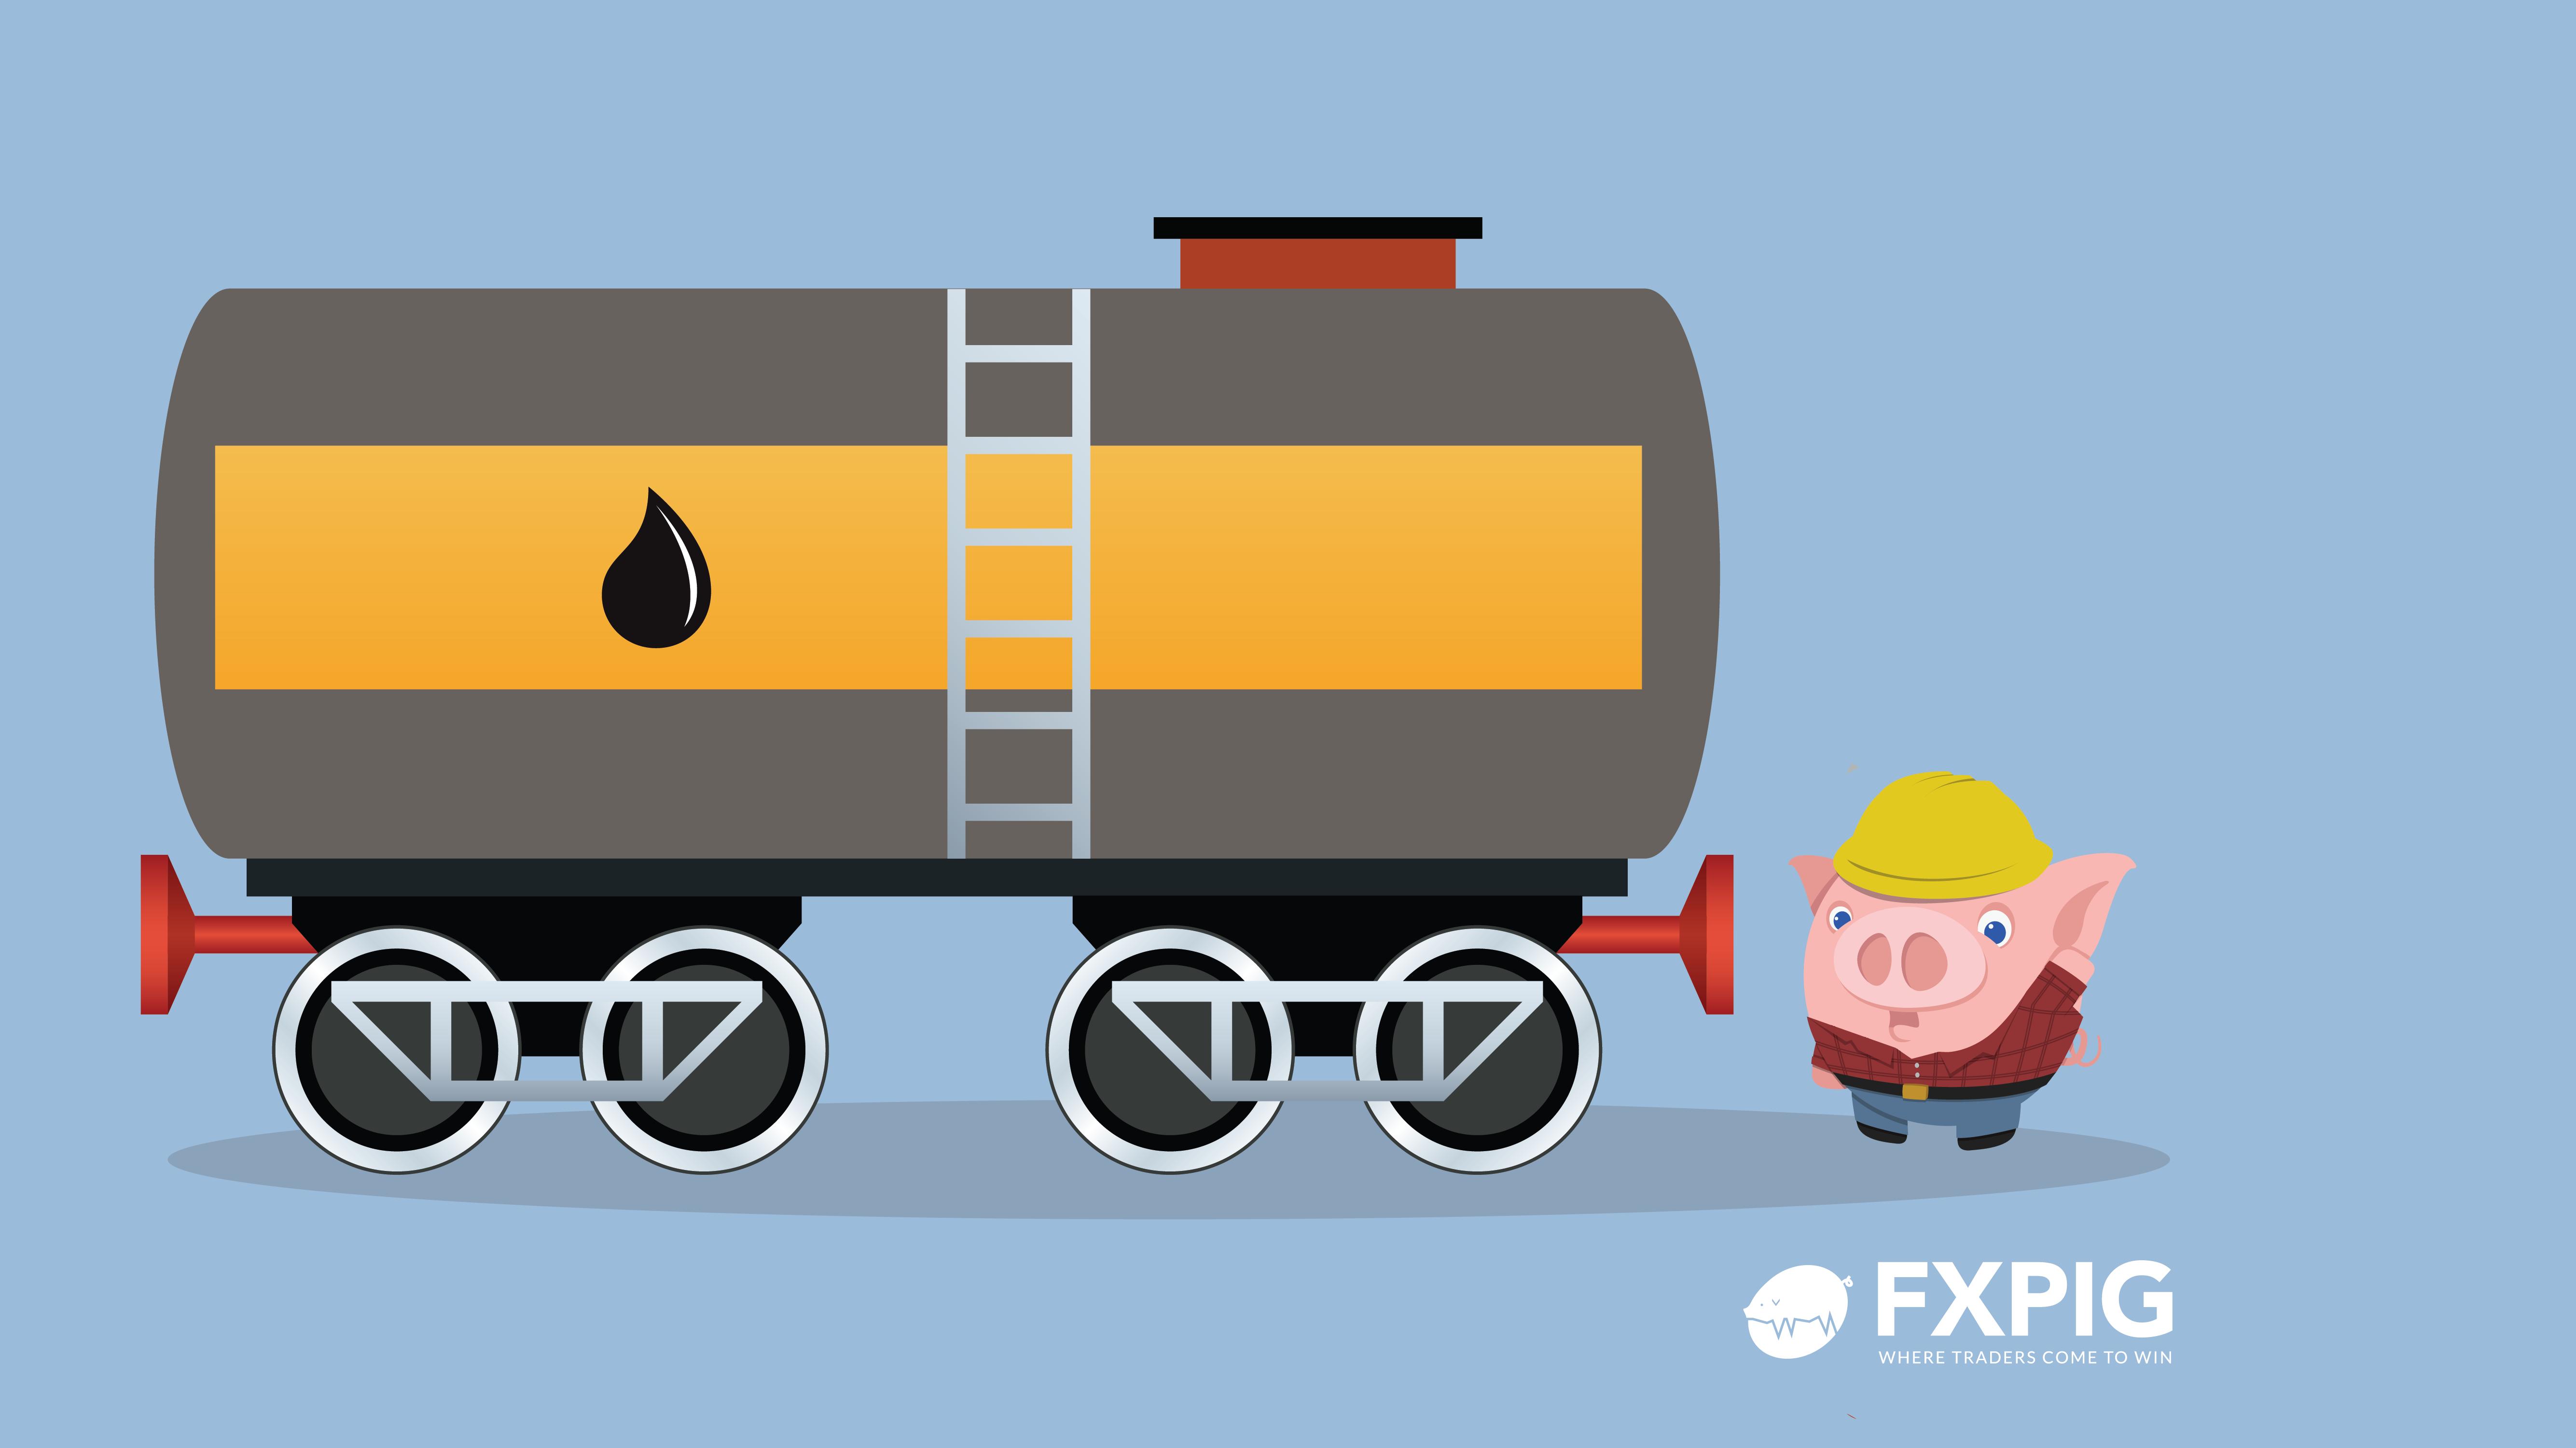 FOREX_OIL_FXPIG